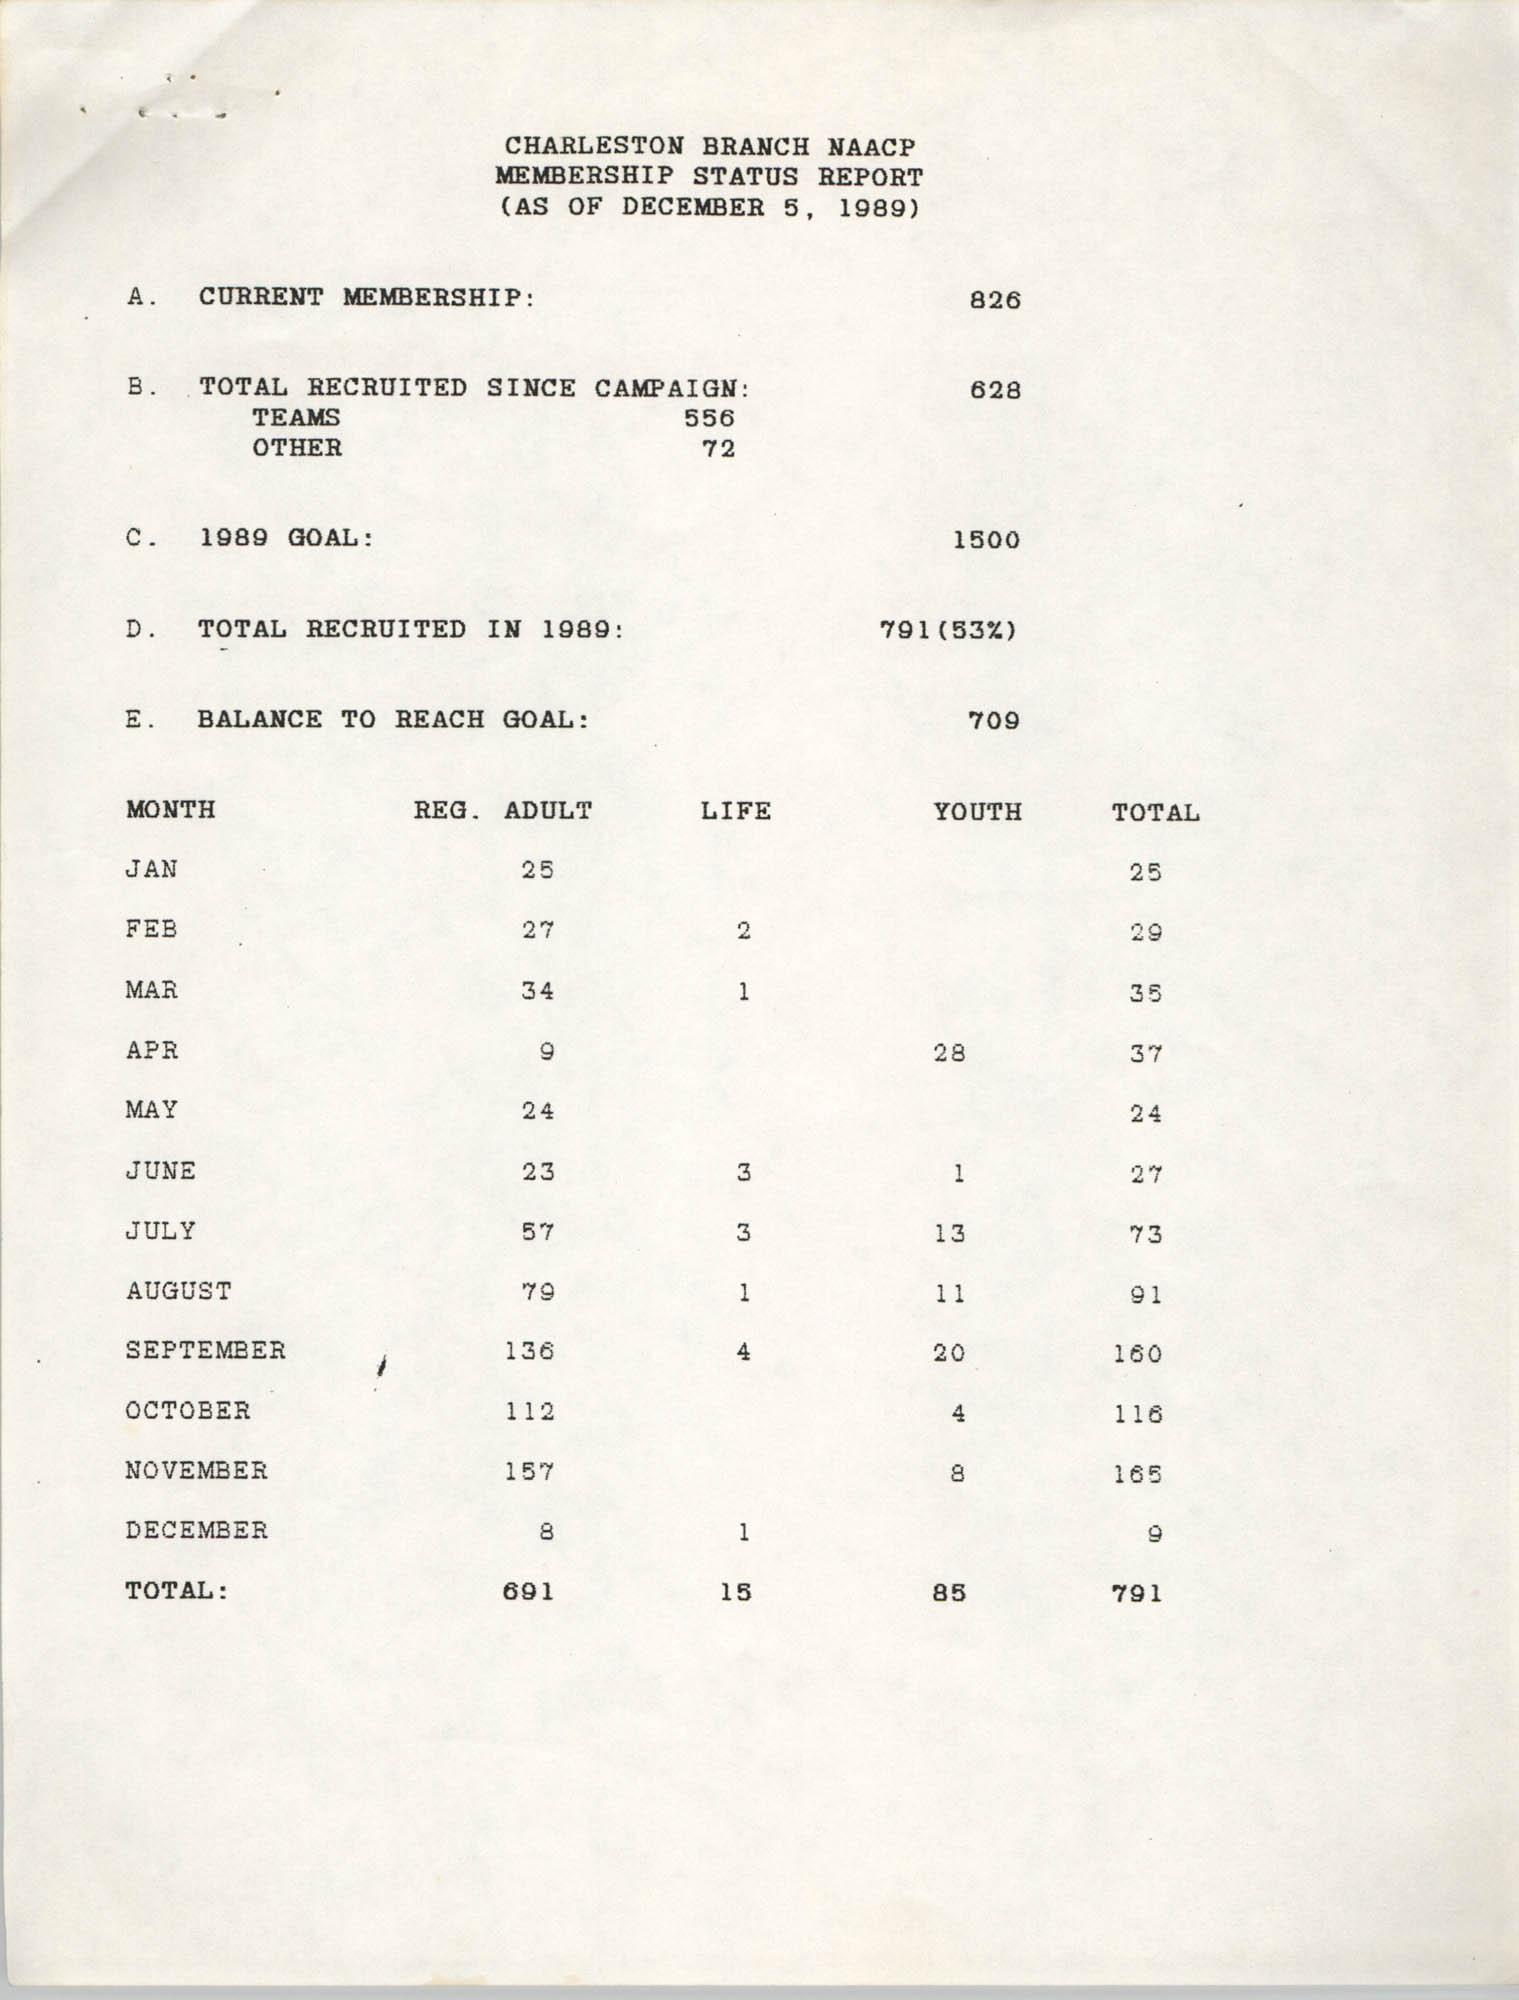 Charleston Branch of the NAACP Membership Status Report, December 5, 1989